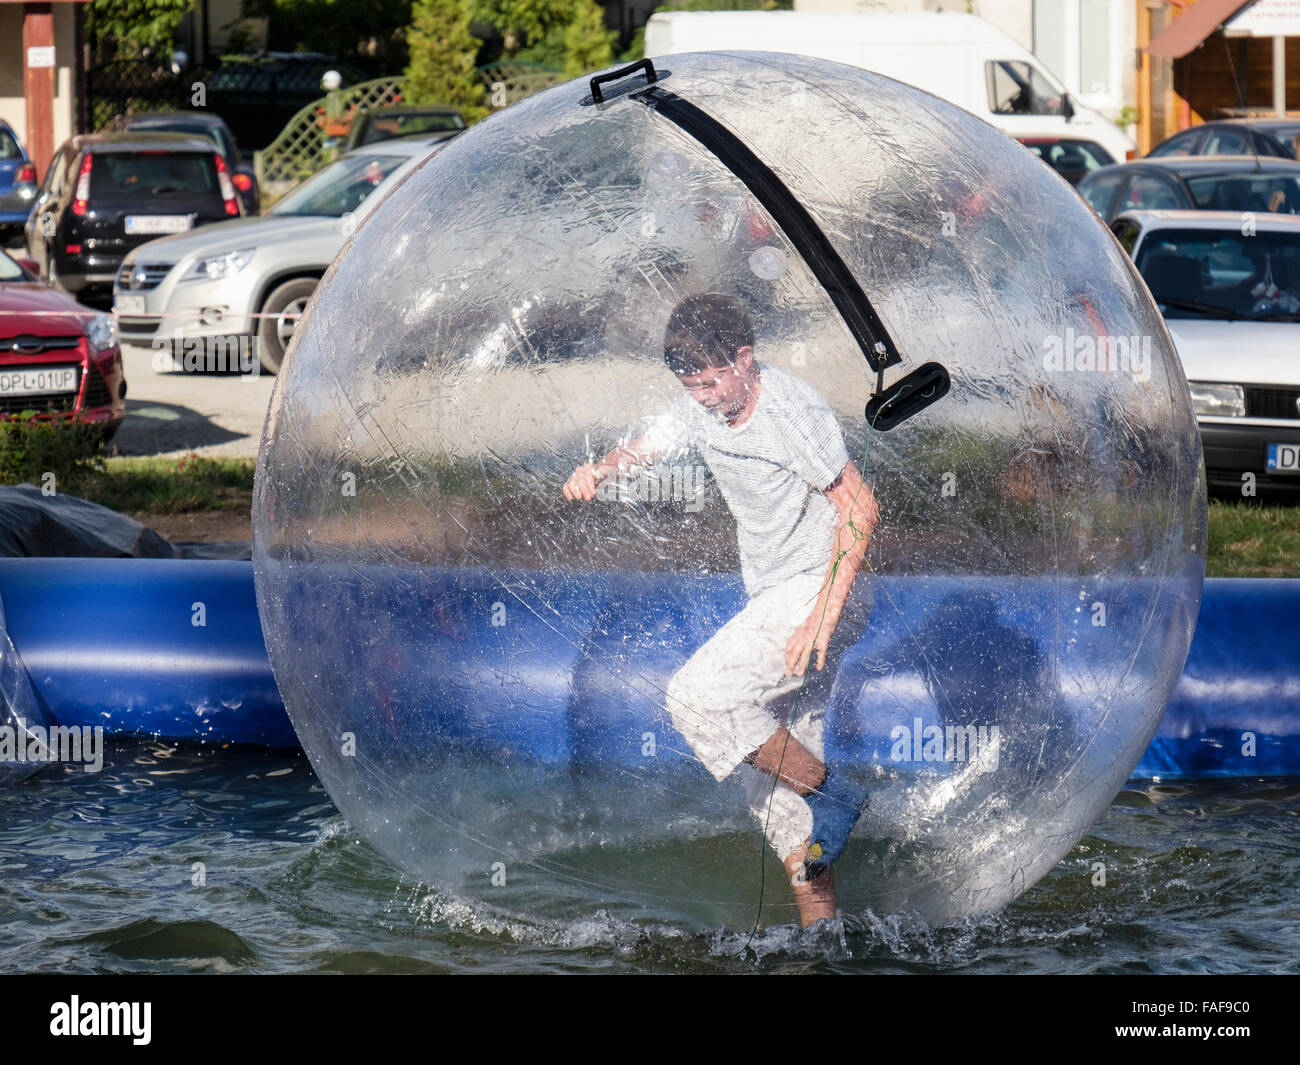 Niño de pie se ejecuta en una pelota inflable zorbing burbuja en un charco de agua. Polanica-Zdroj, Klodzko, Imagen De Stock